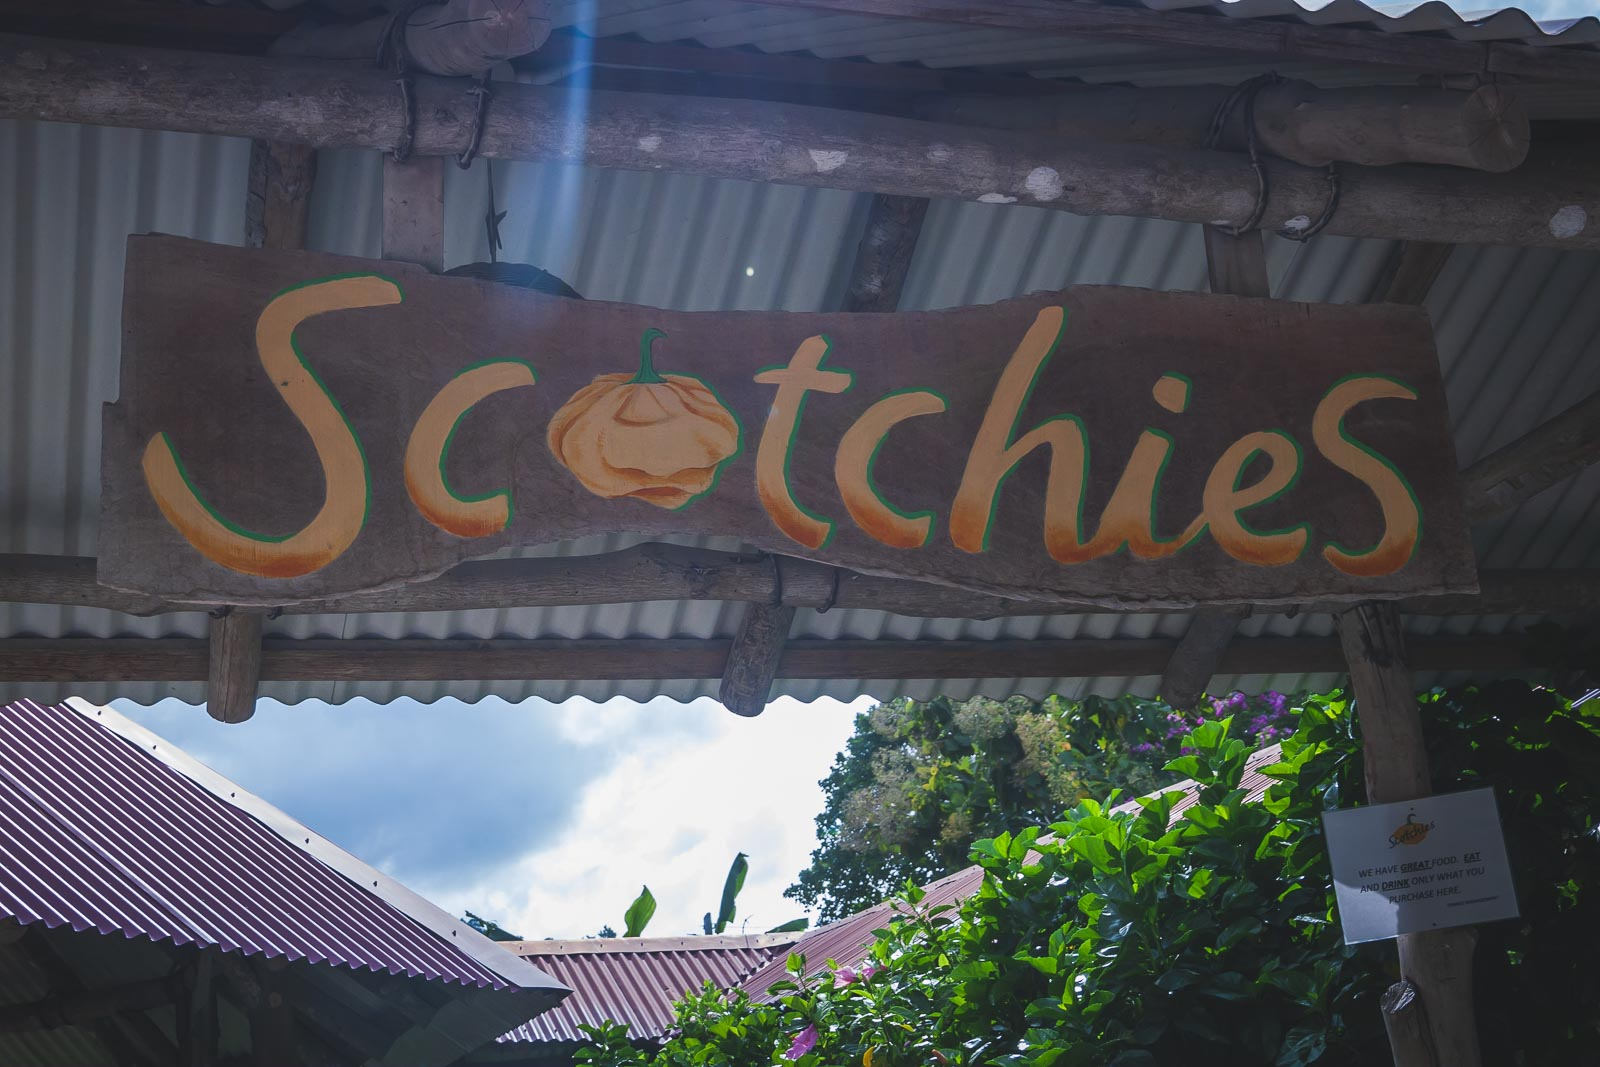 Best Jamaican Food Restaurants Scotchies